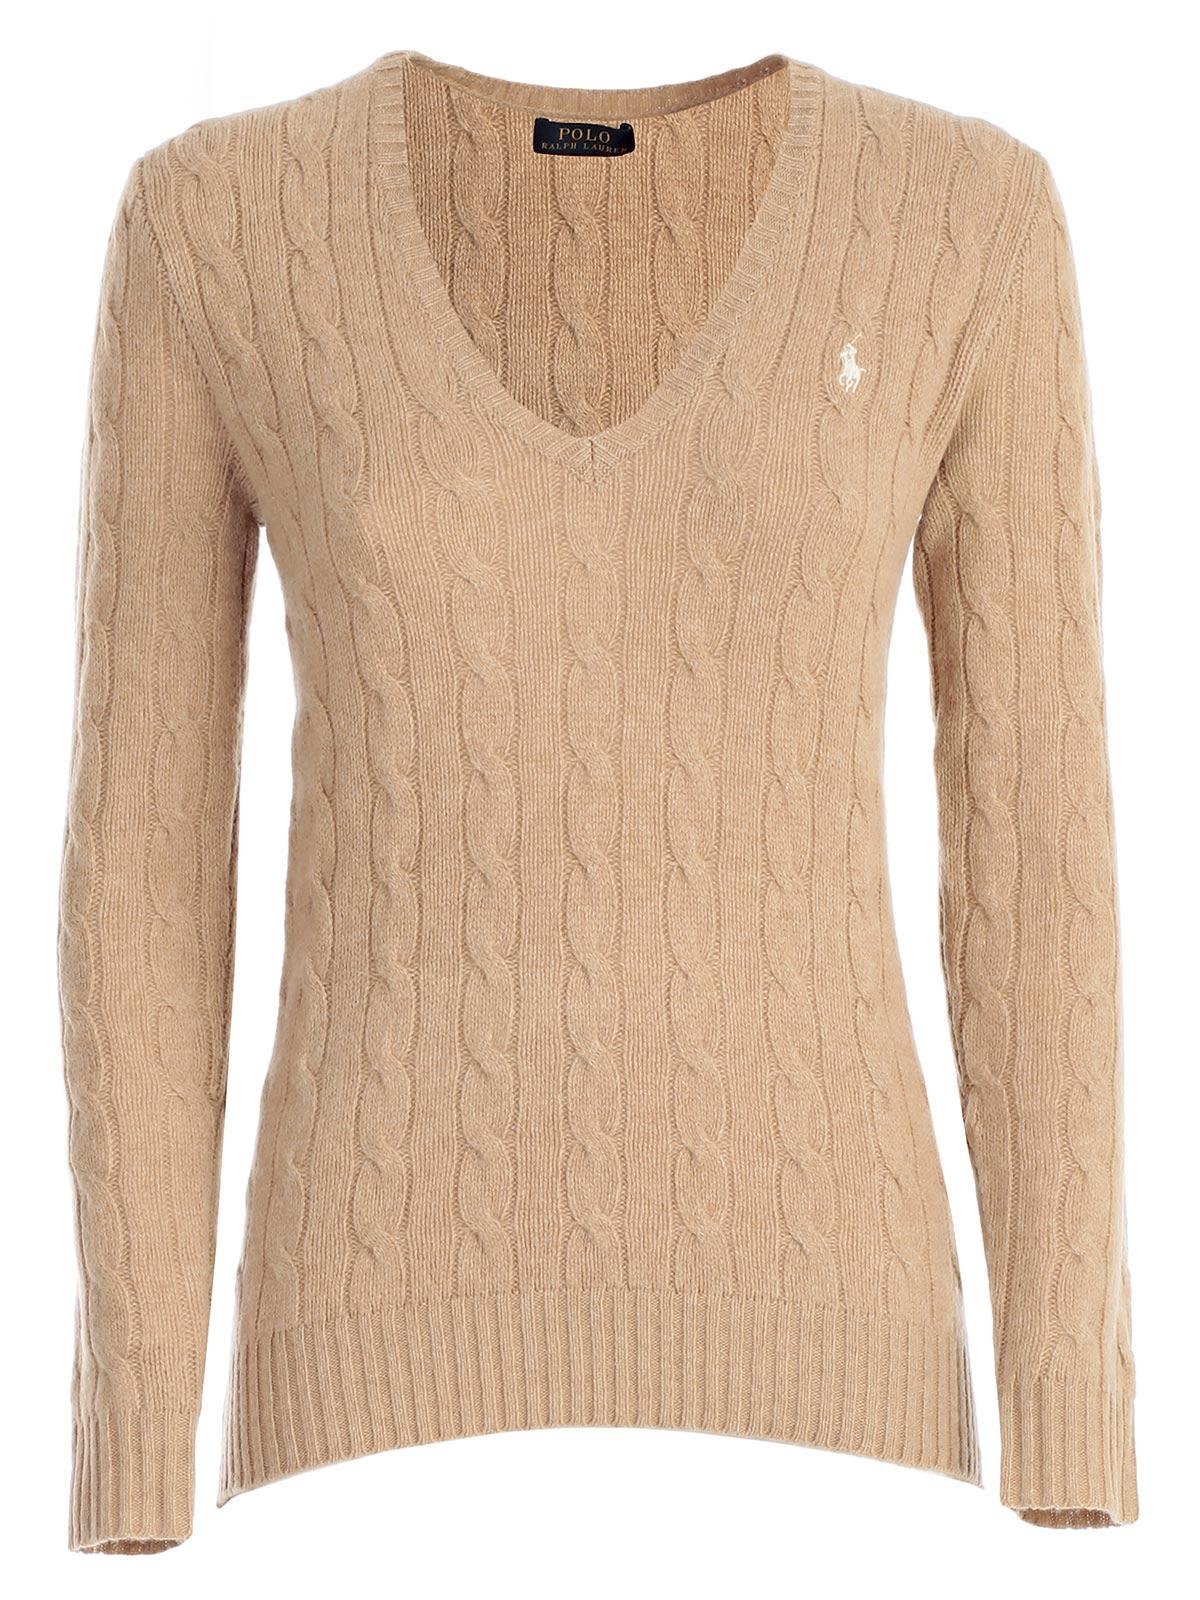 Polo Ralph Lauren Cable Knit V-neck Jumper